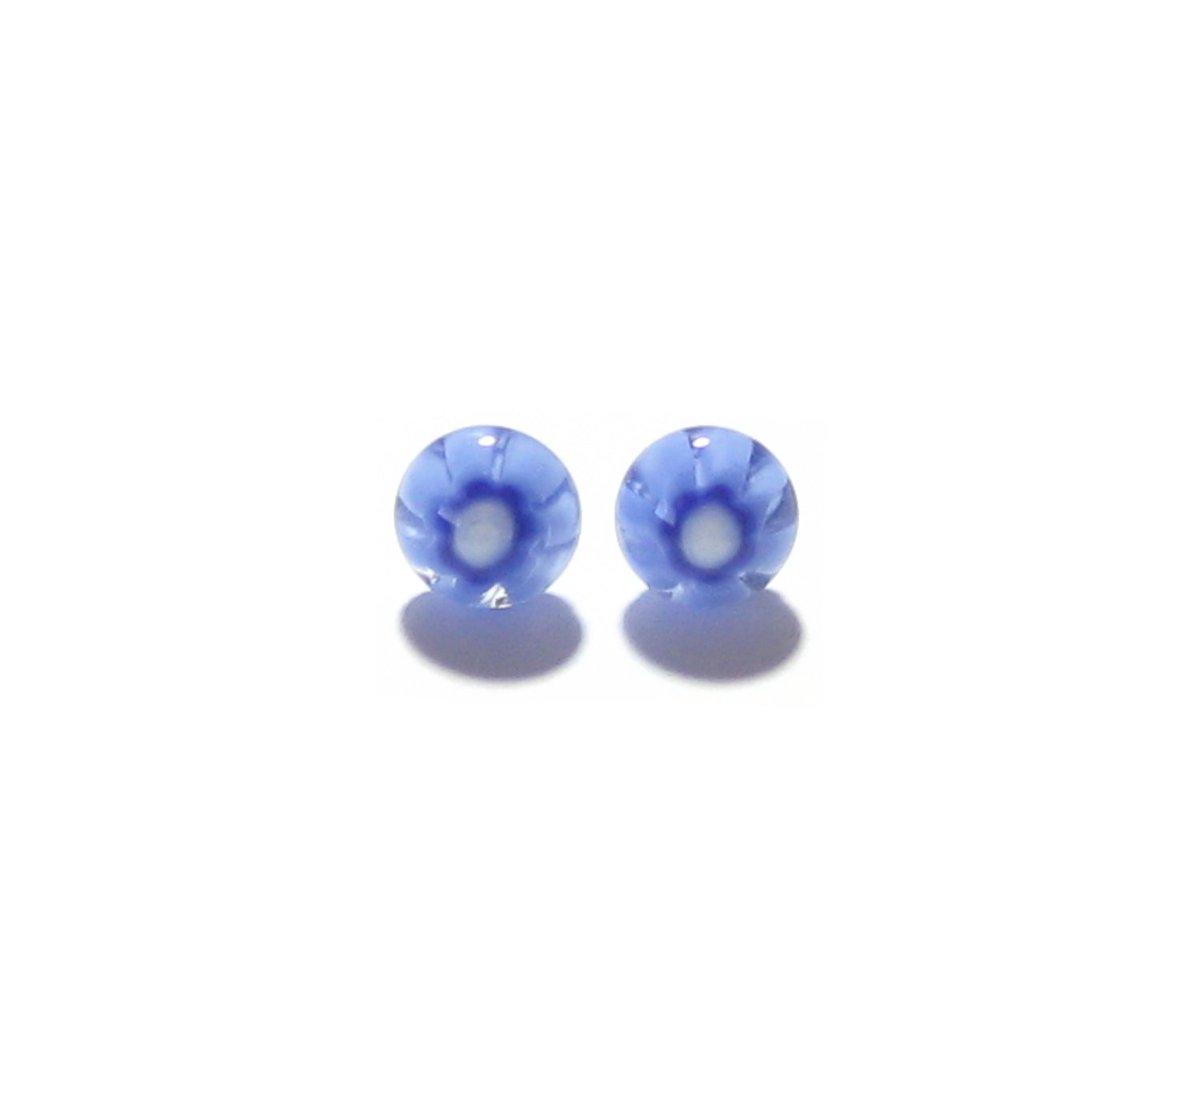 Murano Millefiori Blue Post Earring, Italian Jewelry, Murano Jewelry,…  http:// tuppu.net/71fd9fa7  &nbsp;   #craftshout #handmade <br>http://pic.twitter.com/61wGXB28Ju